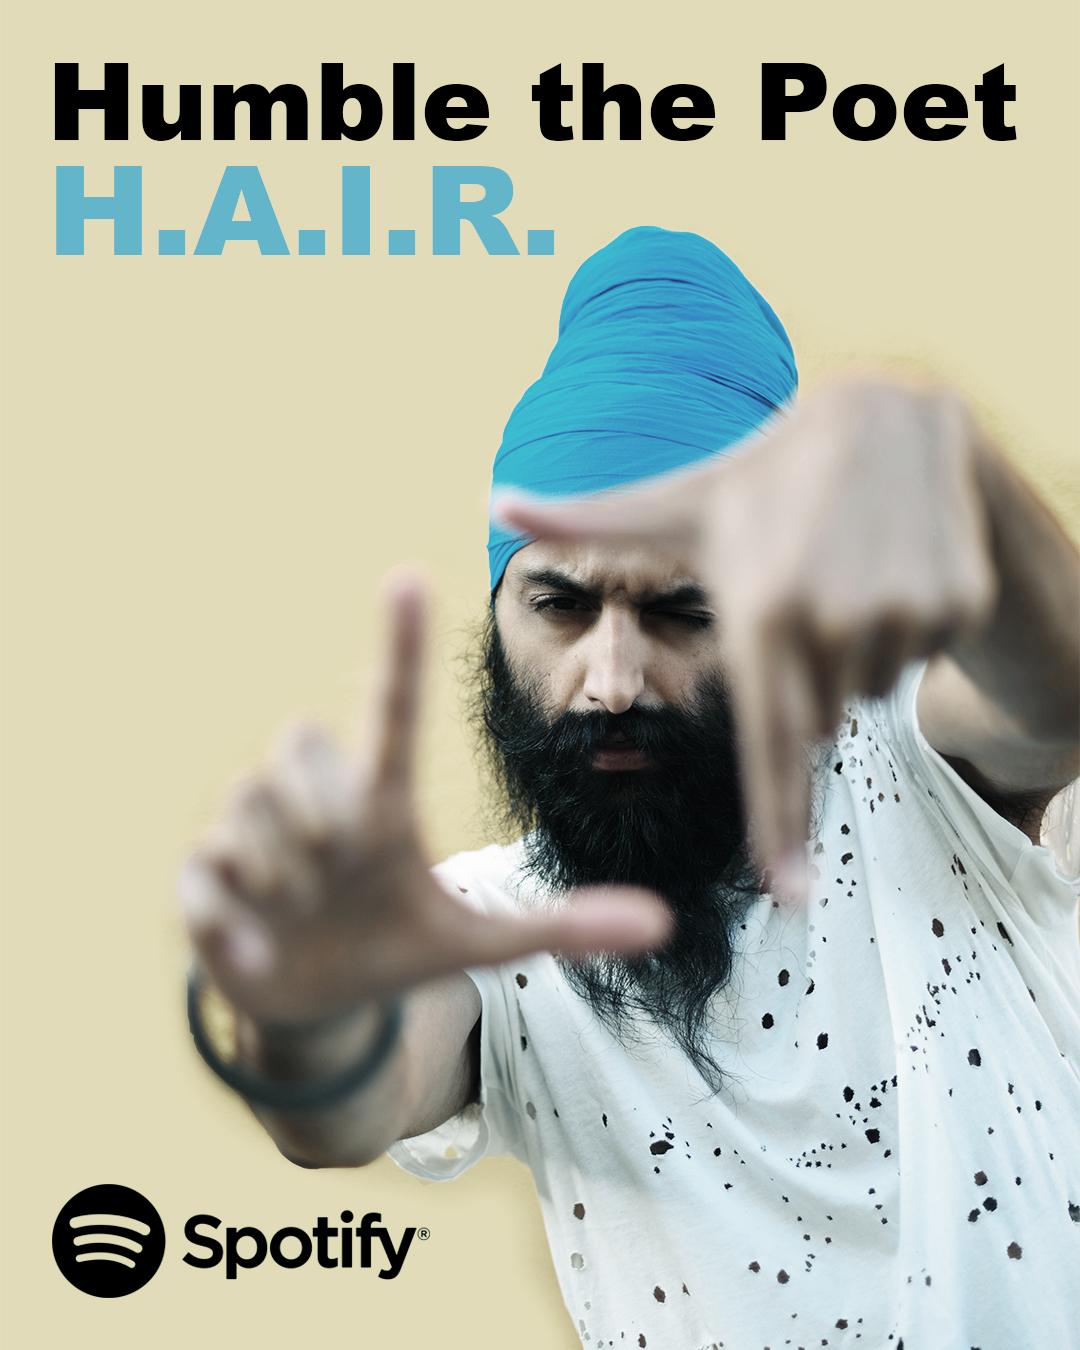 HAIR+on+spotify+promo+instagram.jpg